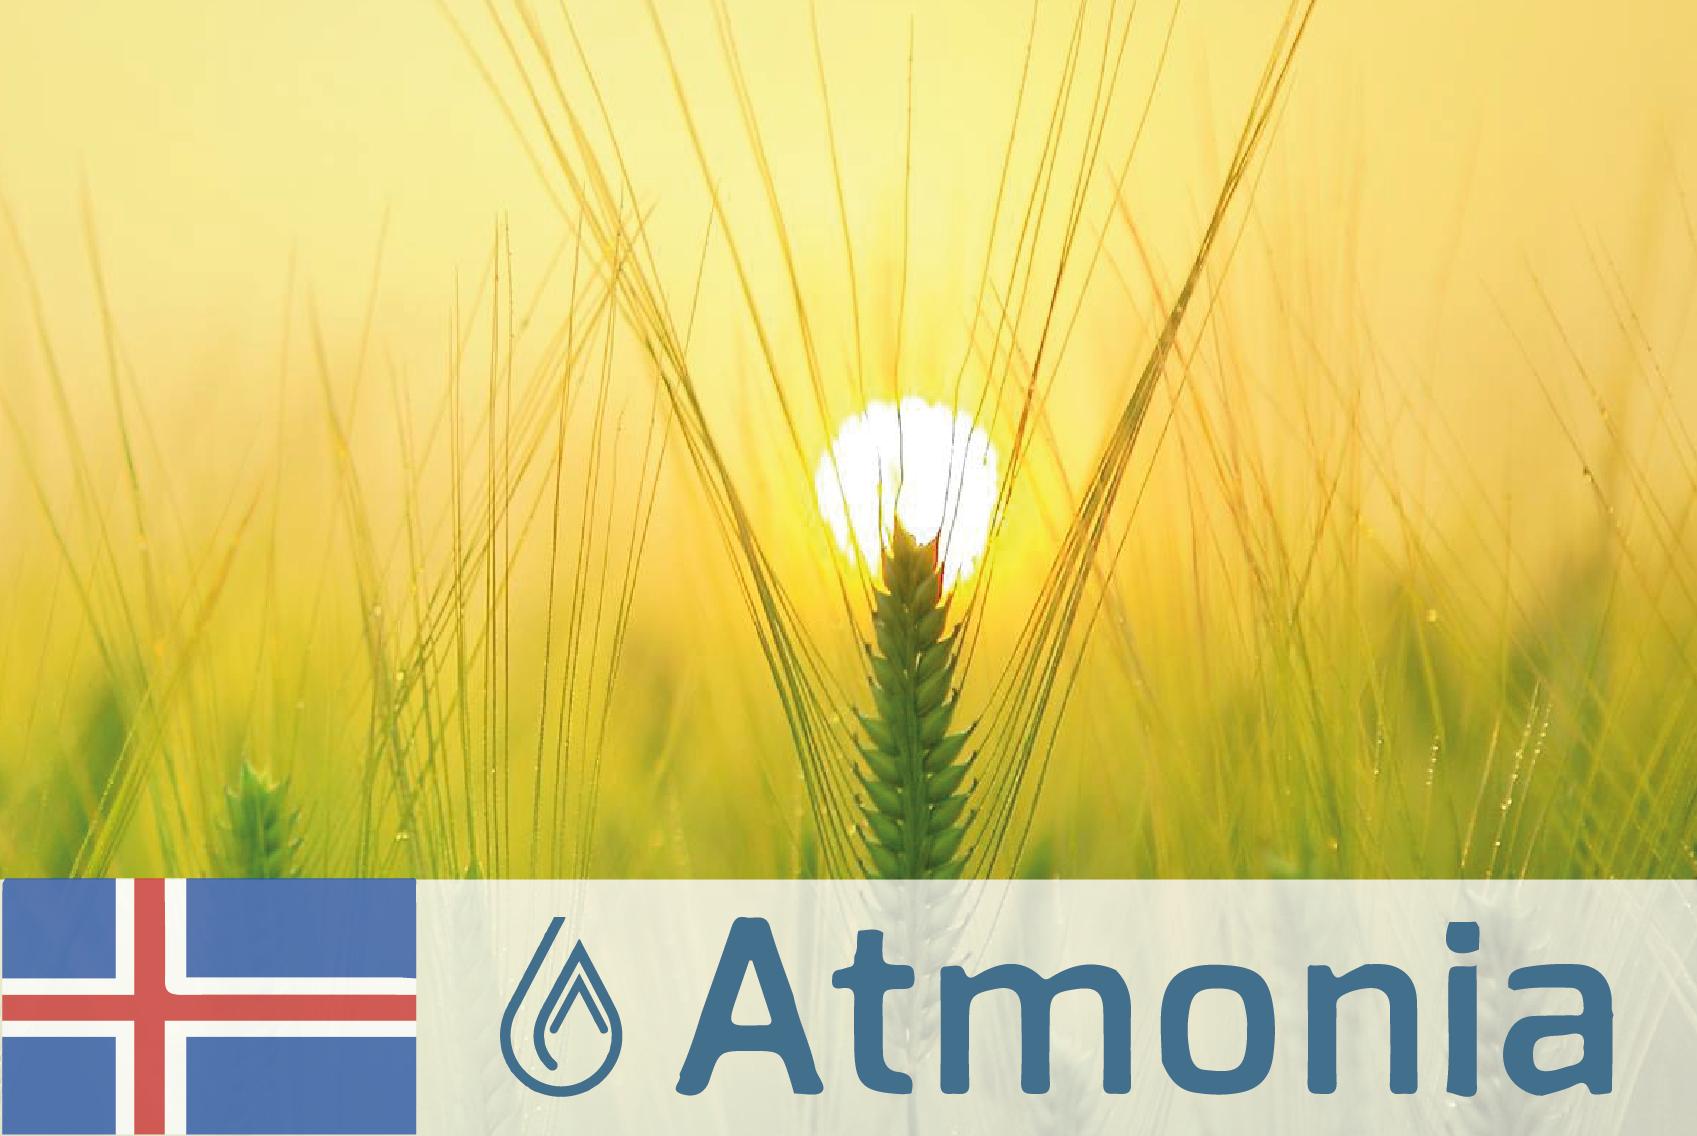 #65 Atmonia - Carbon-free ammonia fertilizers - CIRCit Nord